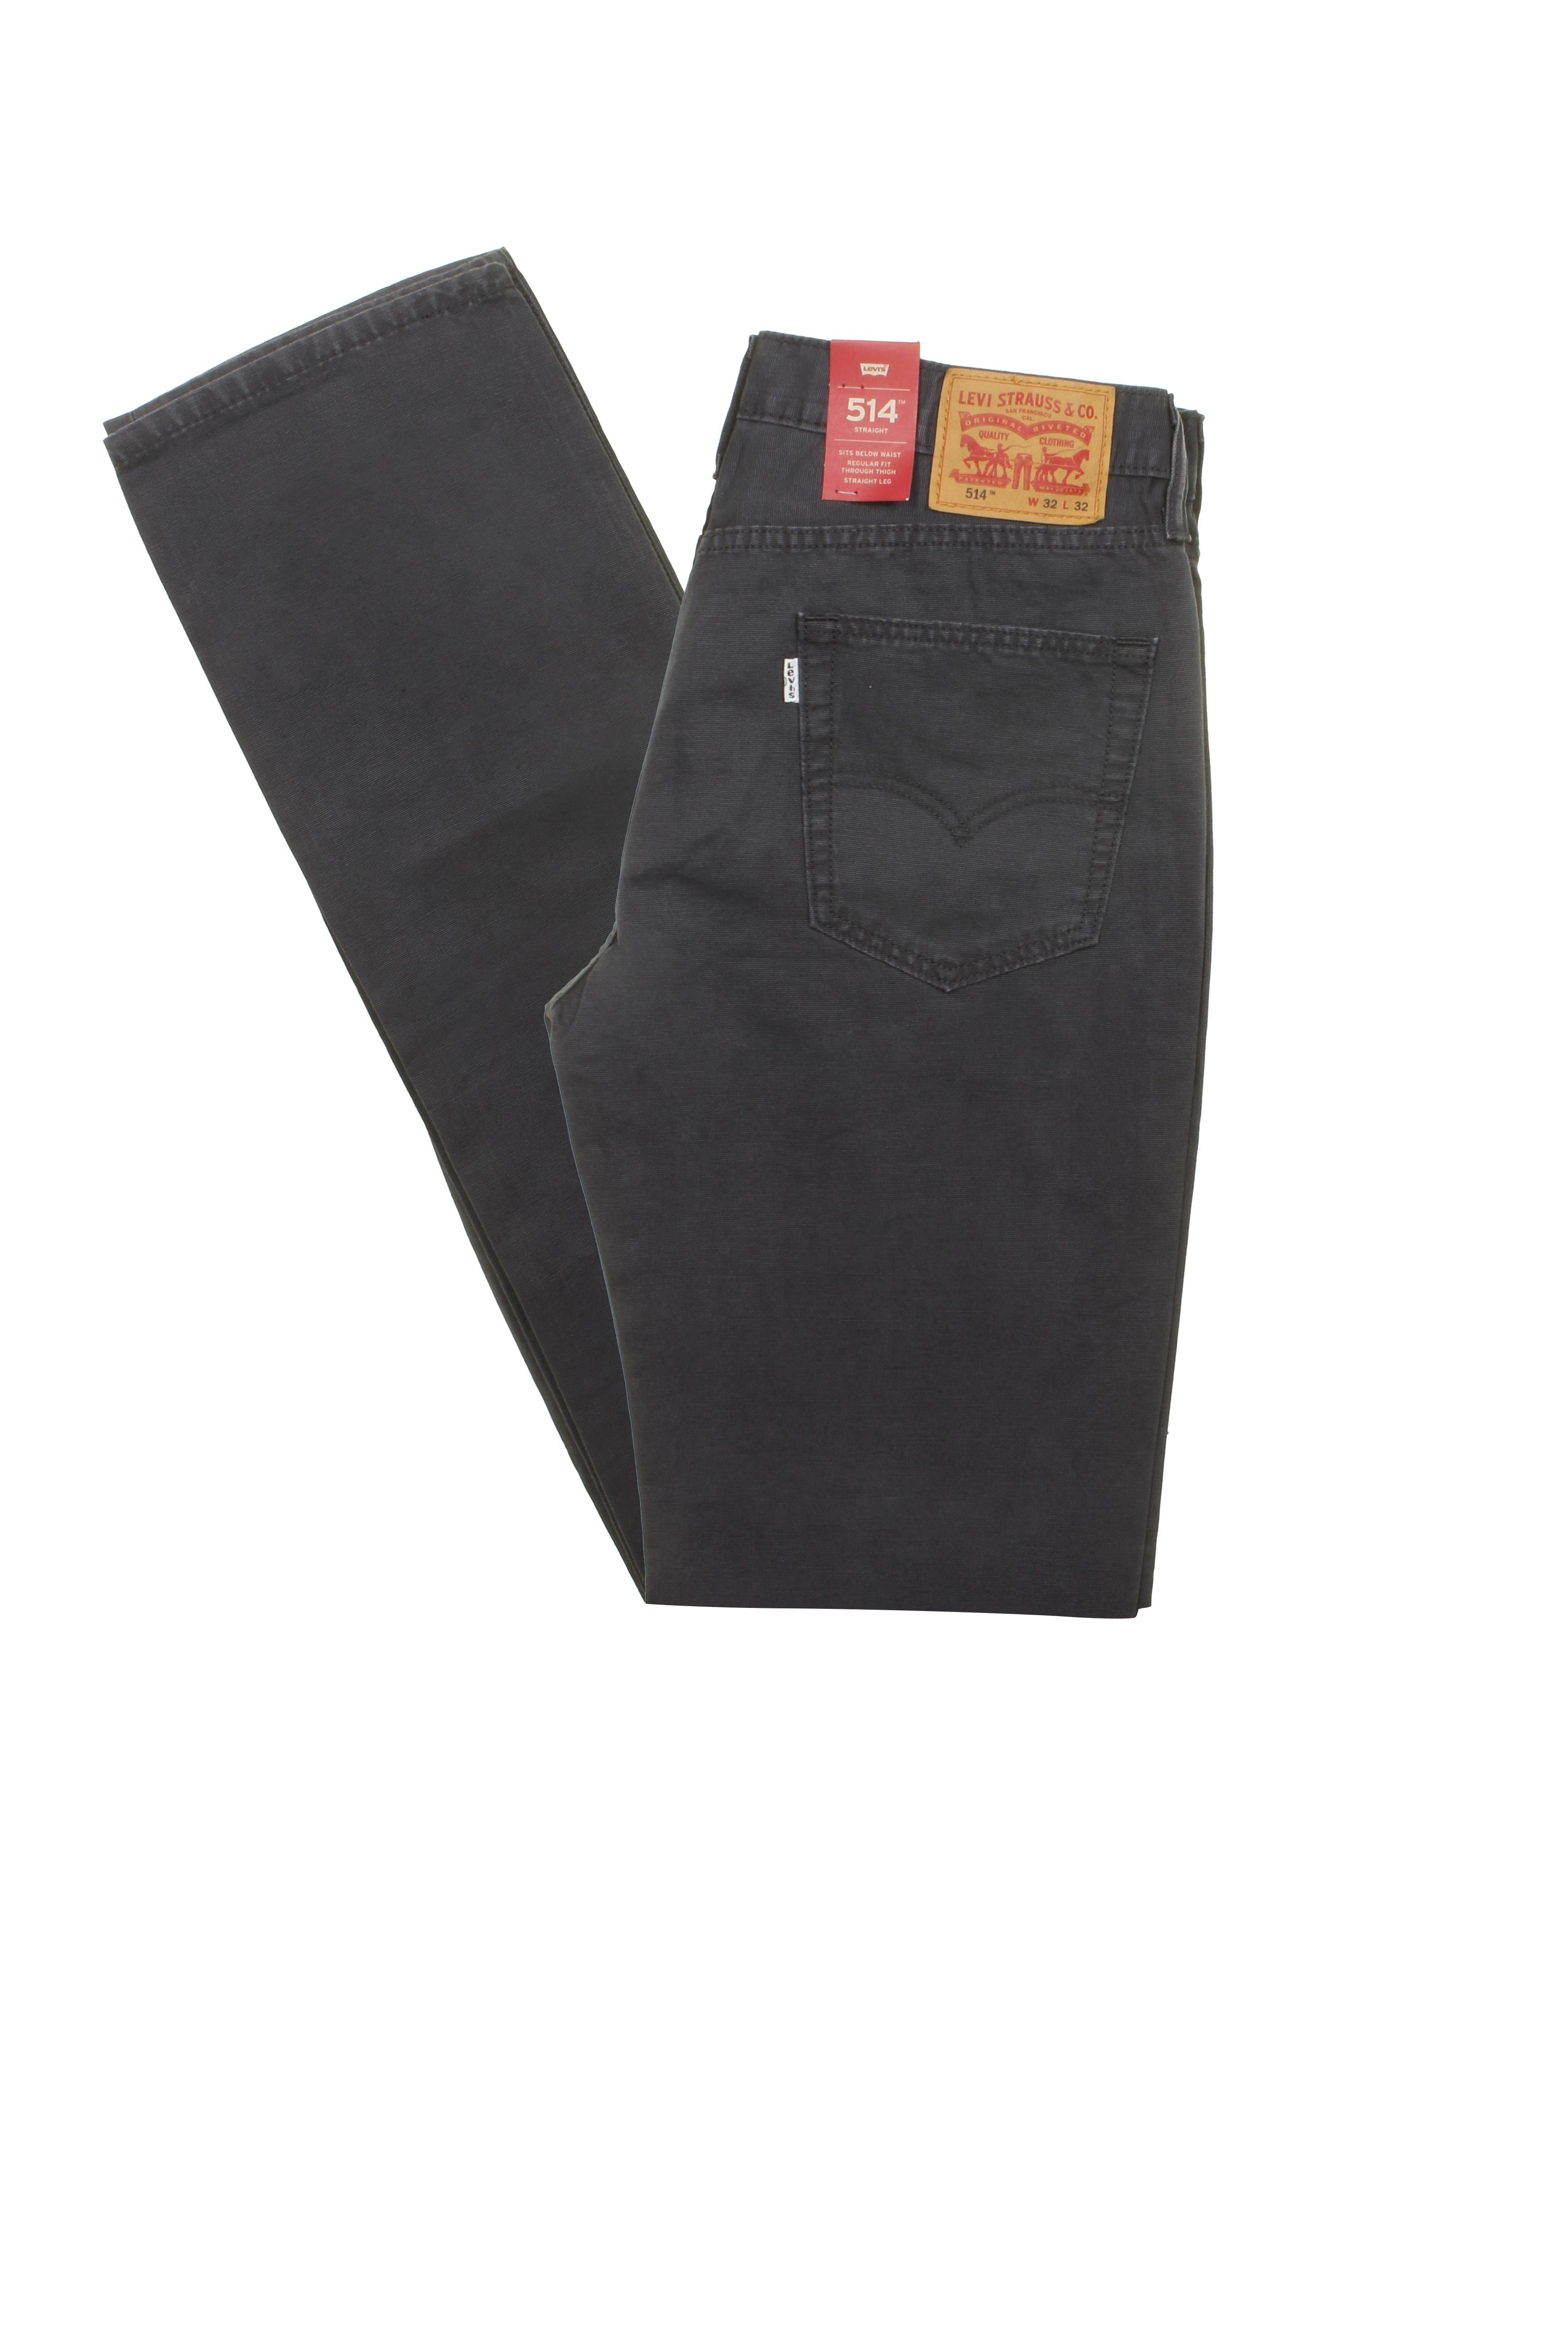 Levis-Men-039-s-514-Regular-Fit-Straight-Leg-Jeans thumbnail 11